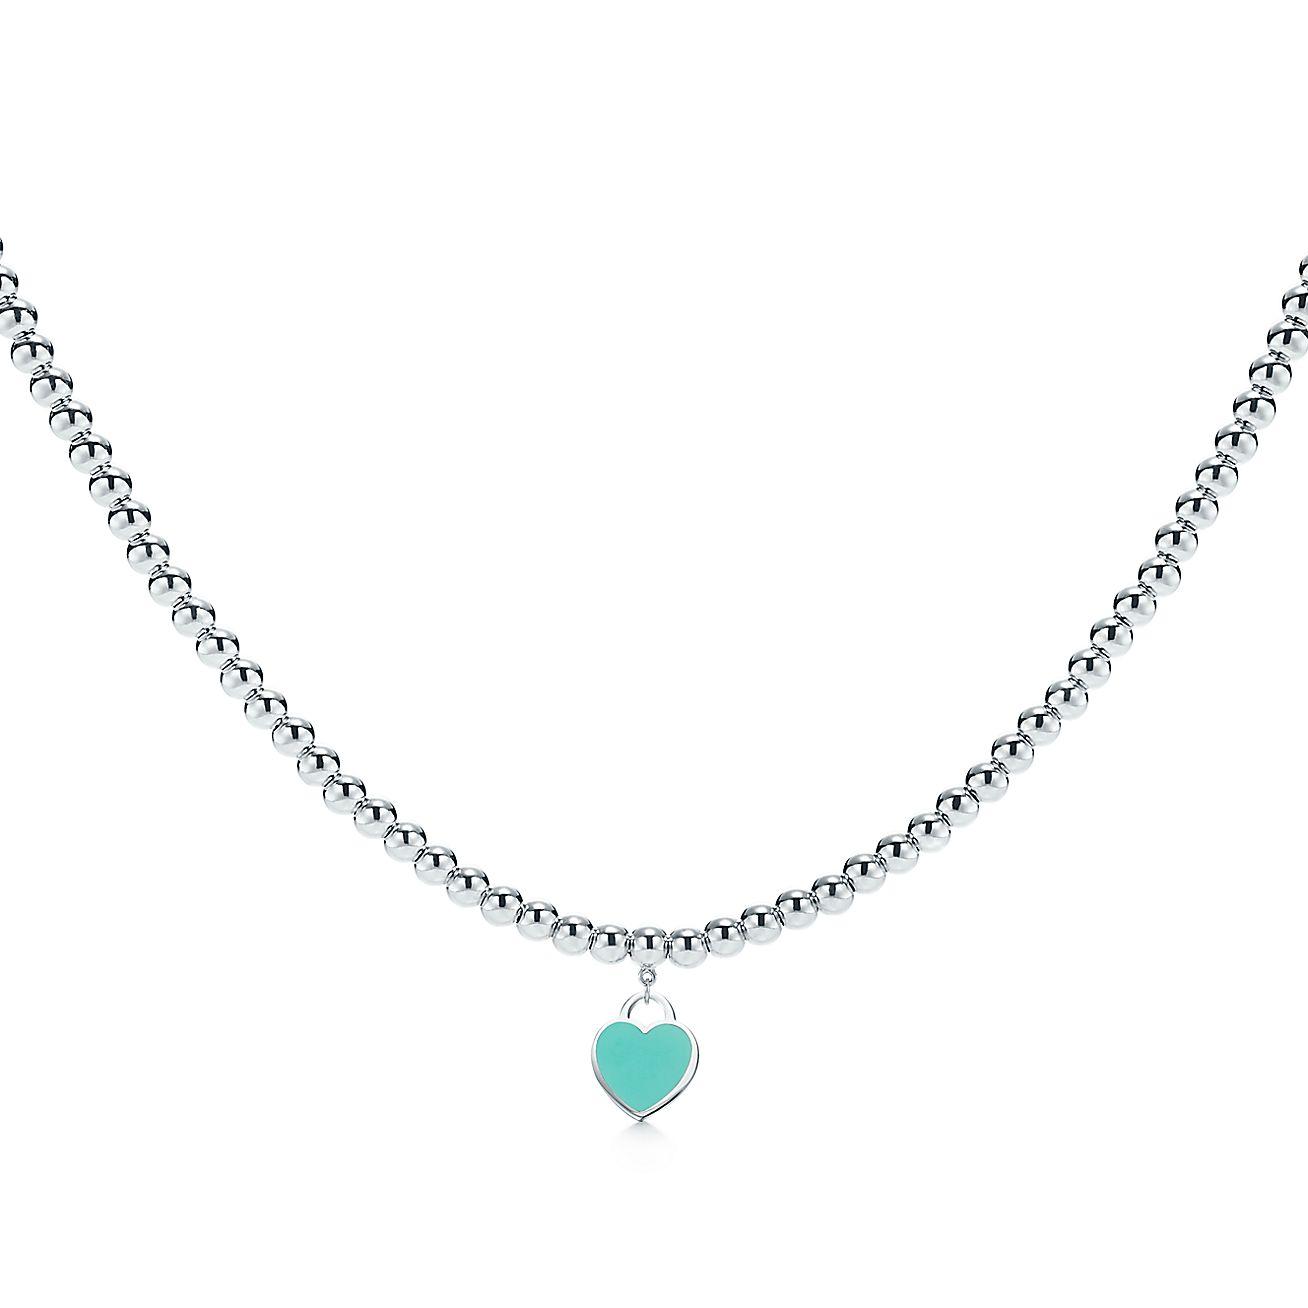 Return to tiffany heart tag necklace in sterling silver on a beaded return to tiffany heart tag necklace in sterling silver on a beaded necklace tiffany co aloadofball Choice Image